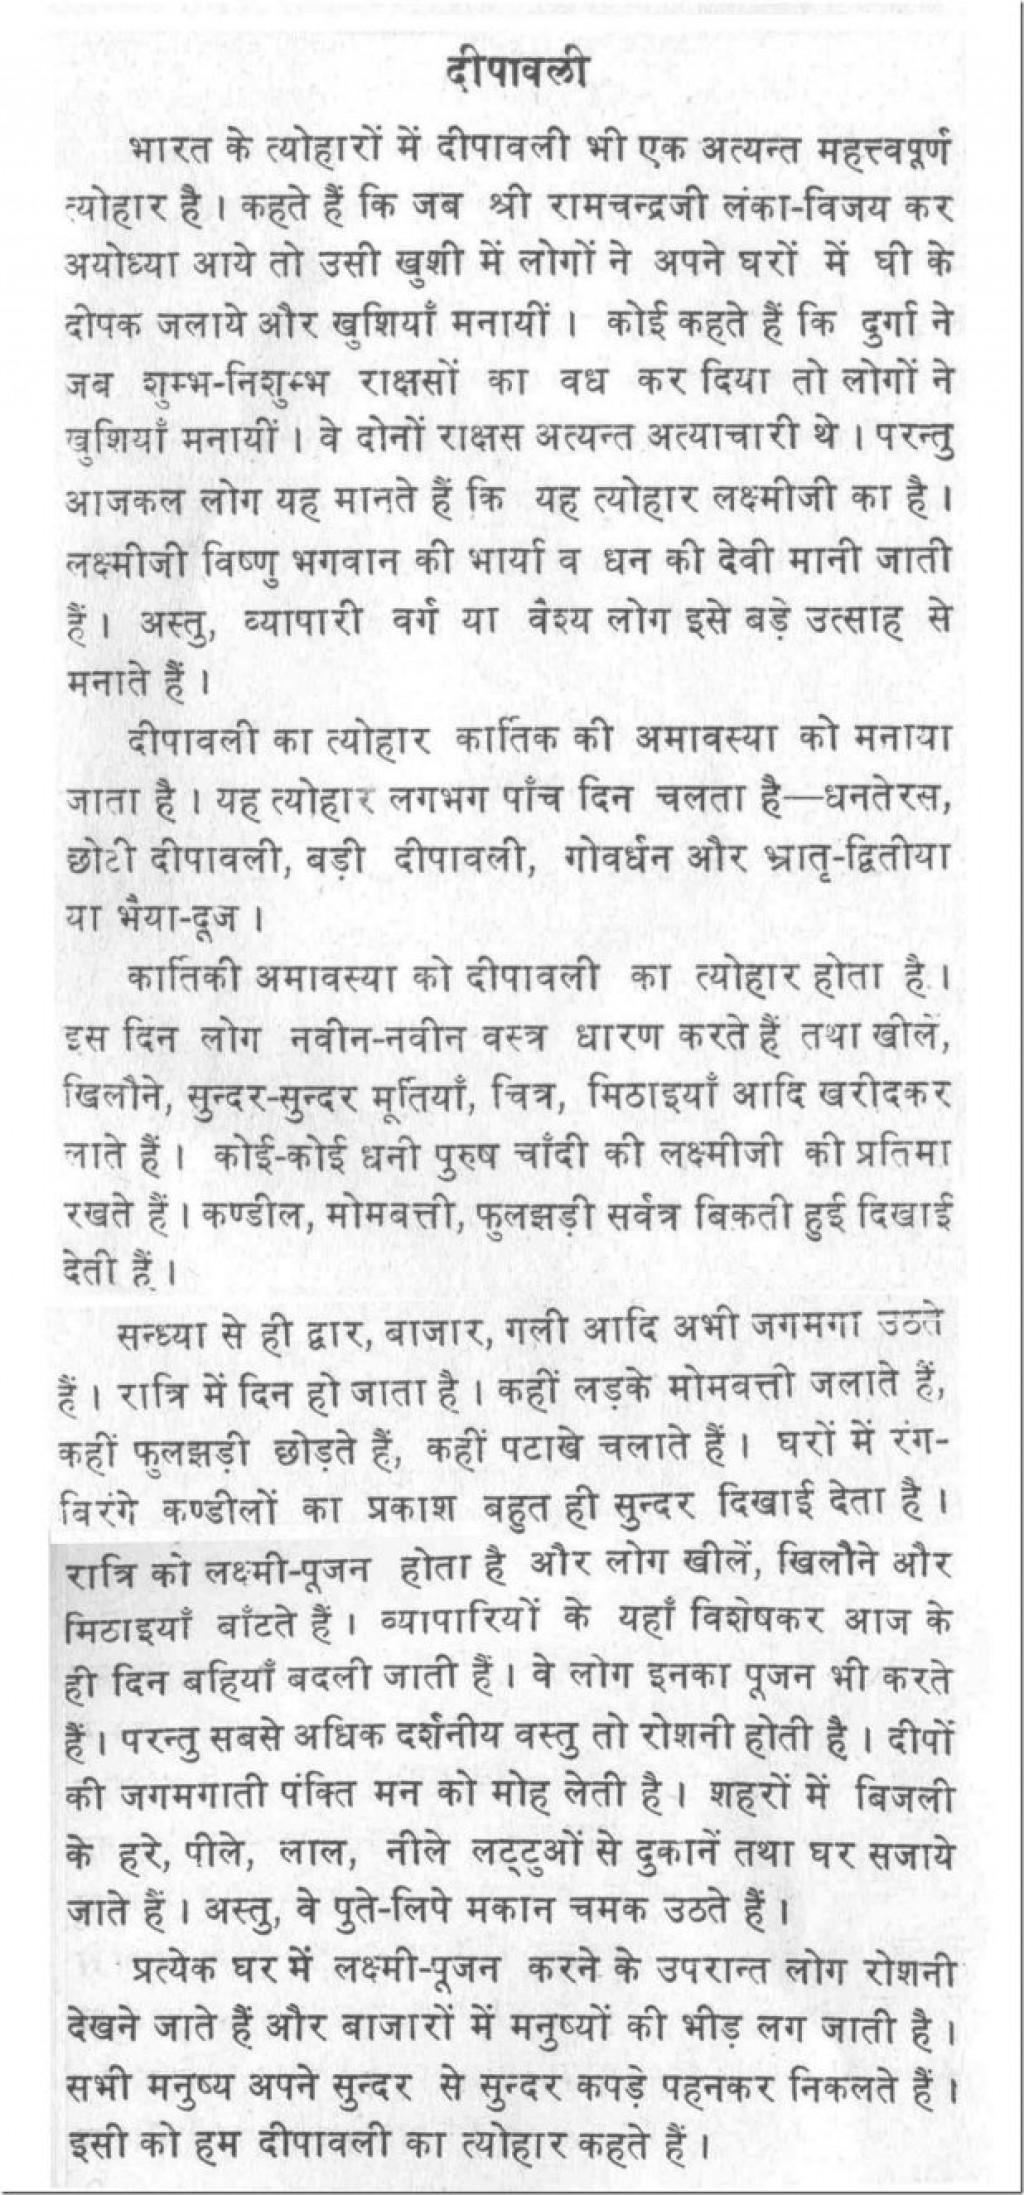 013 Essay Example Diwali Short English Thumb Deepavali In Bengali Marathi About Tamil Kannada Spm Telugu Sanskrit Hindi Mai 618x1325 Unbelievable Festival Christmas Language Large